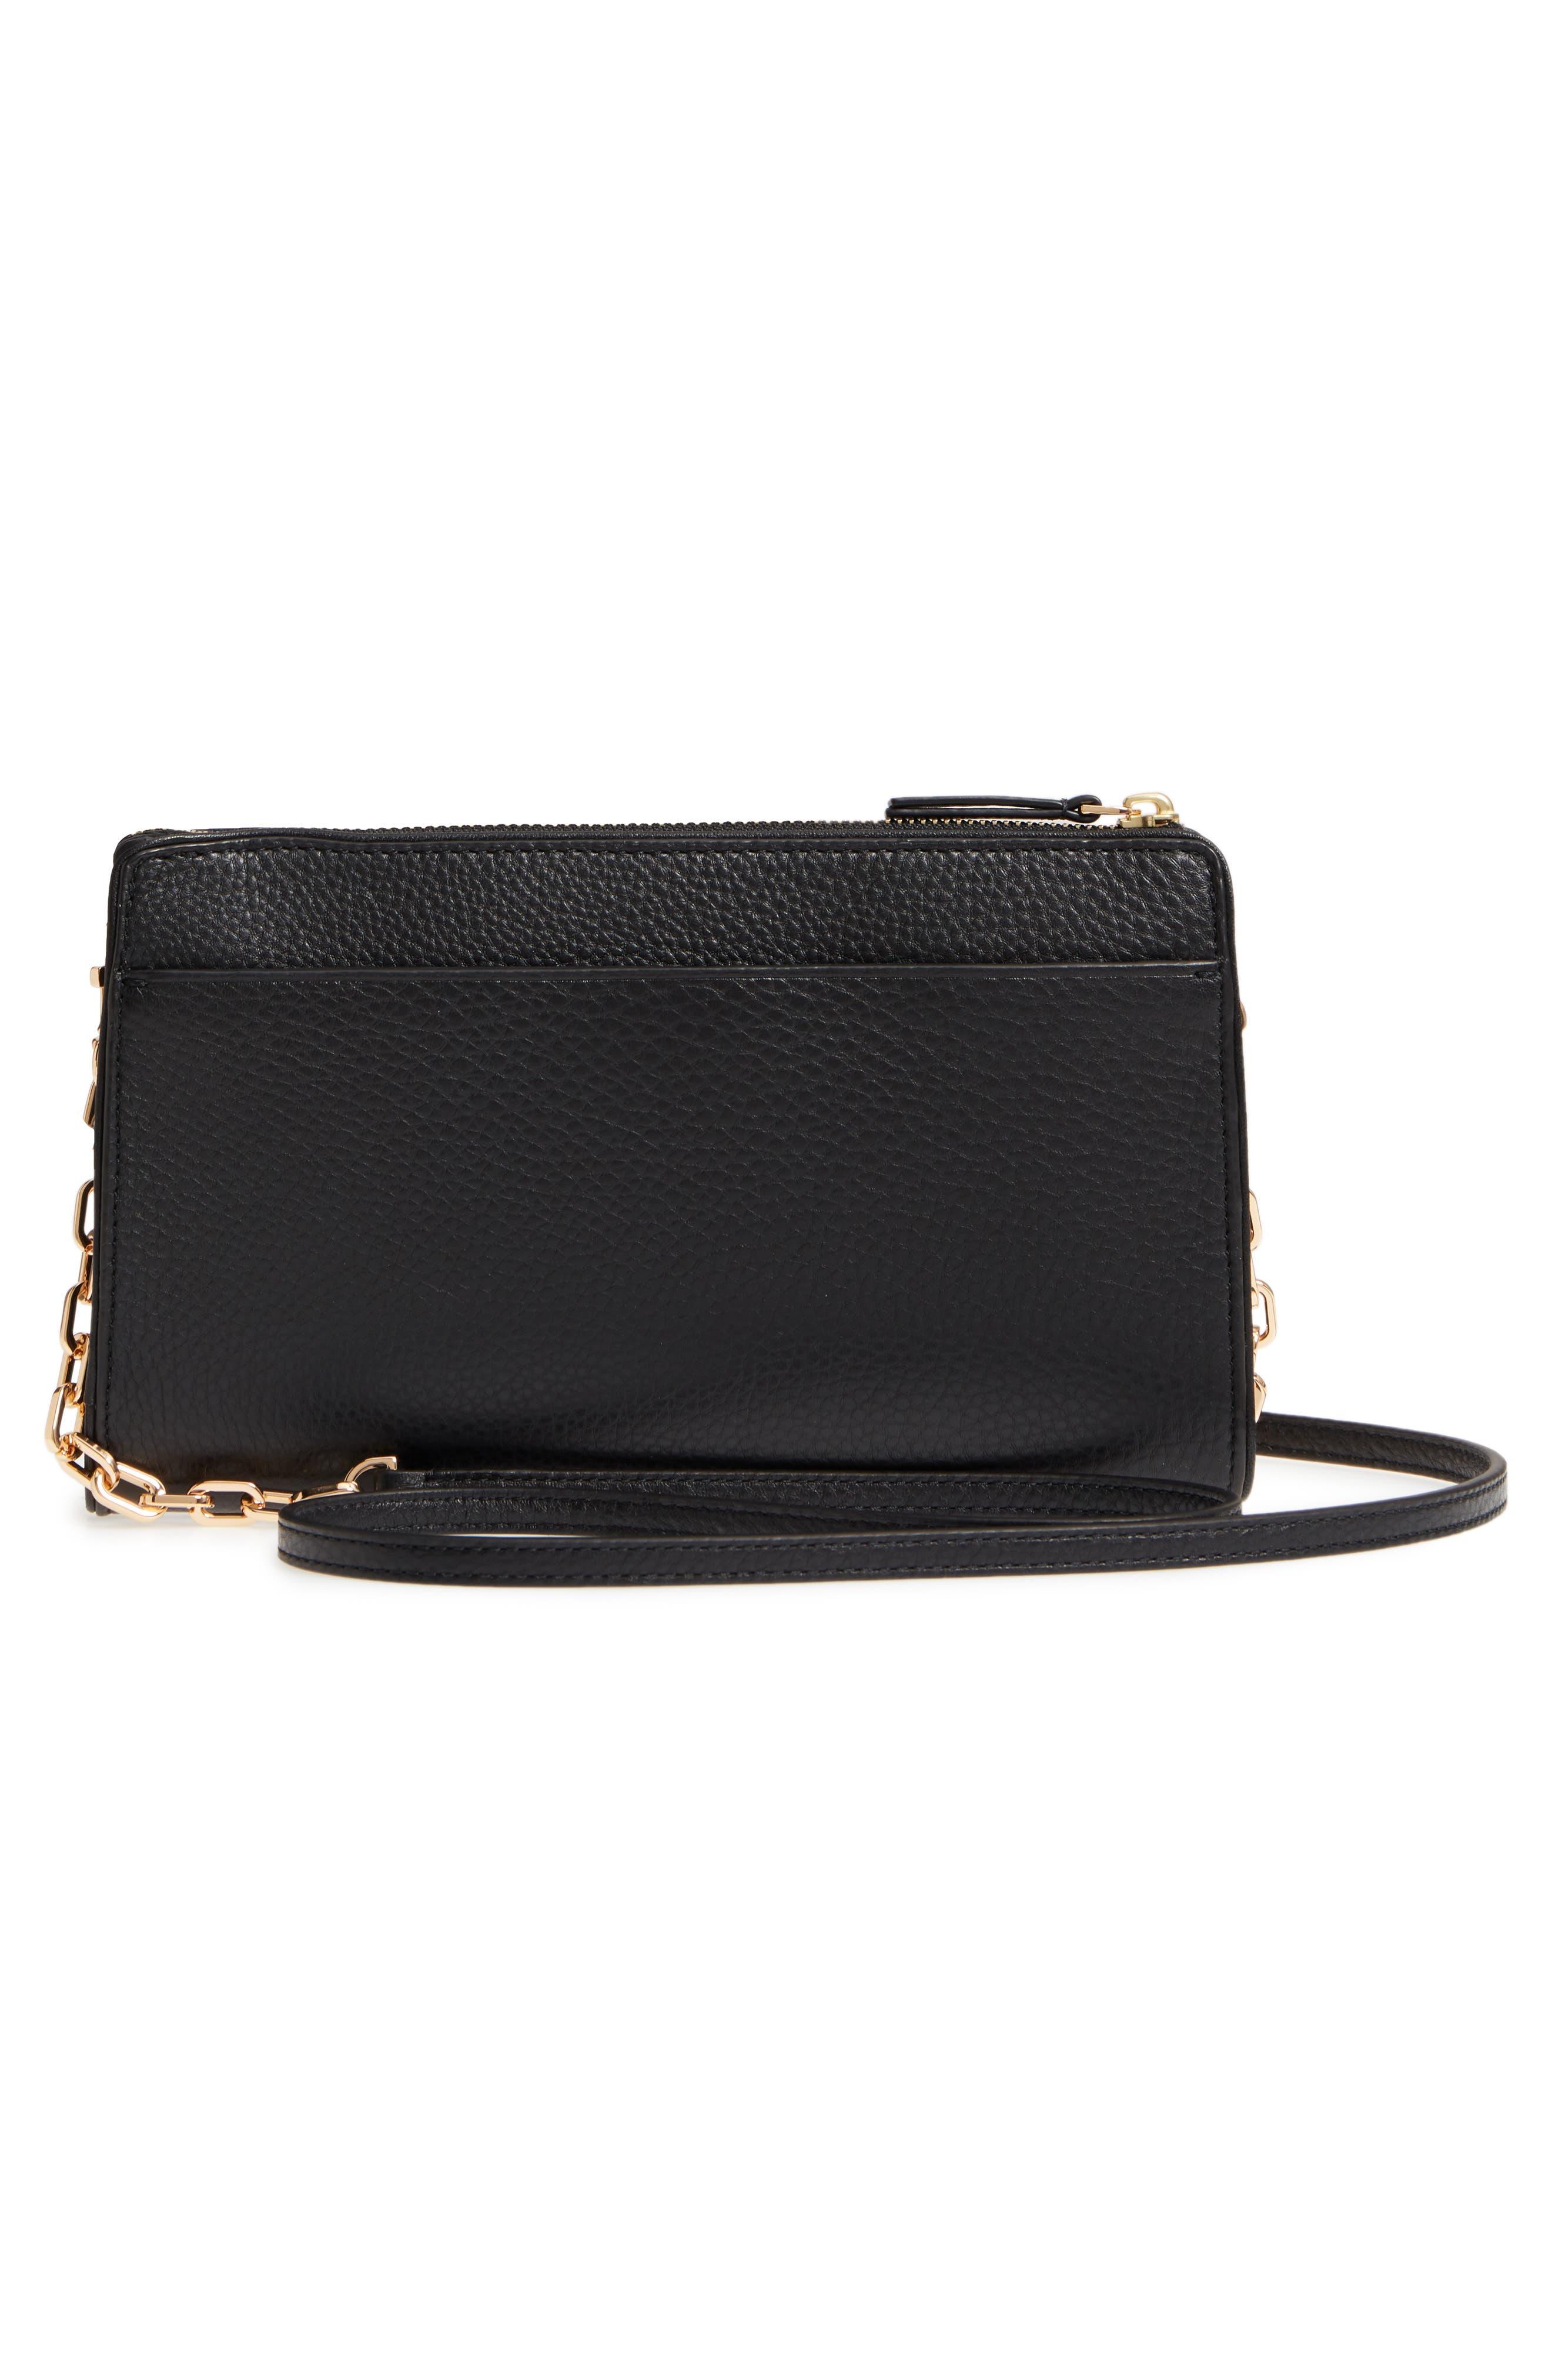 Marsden Leather Wallet Crossbody Bag,                             Alternate thumbnail 3, color,                             Black